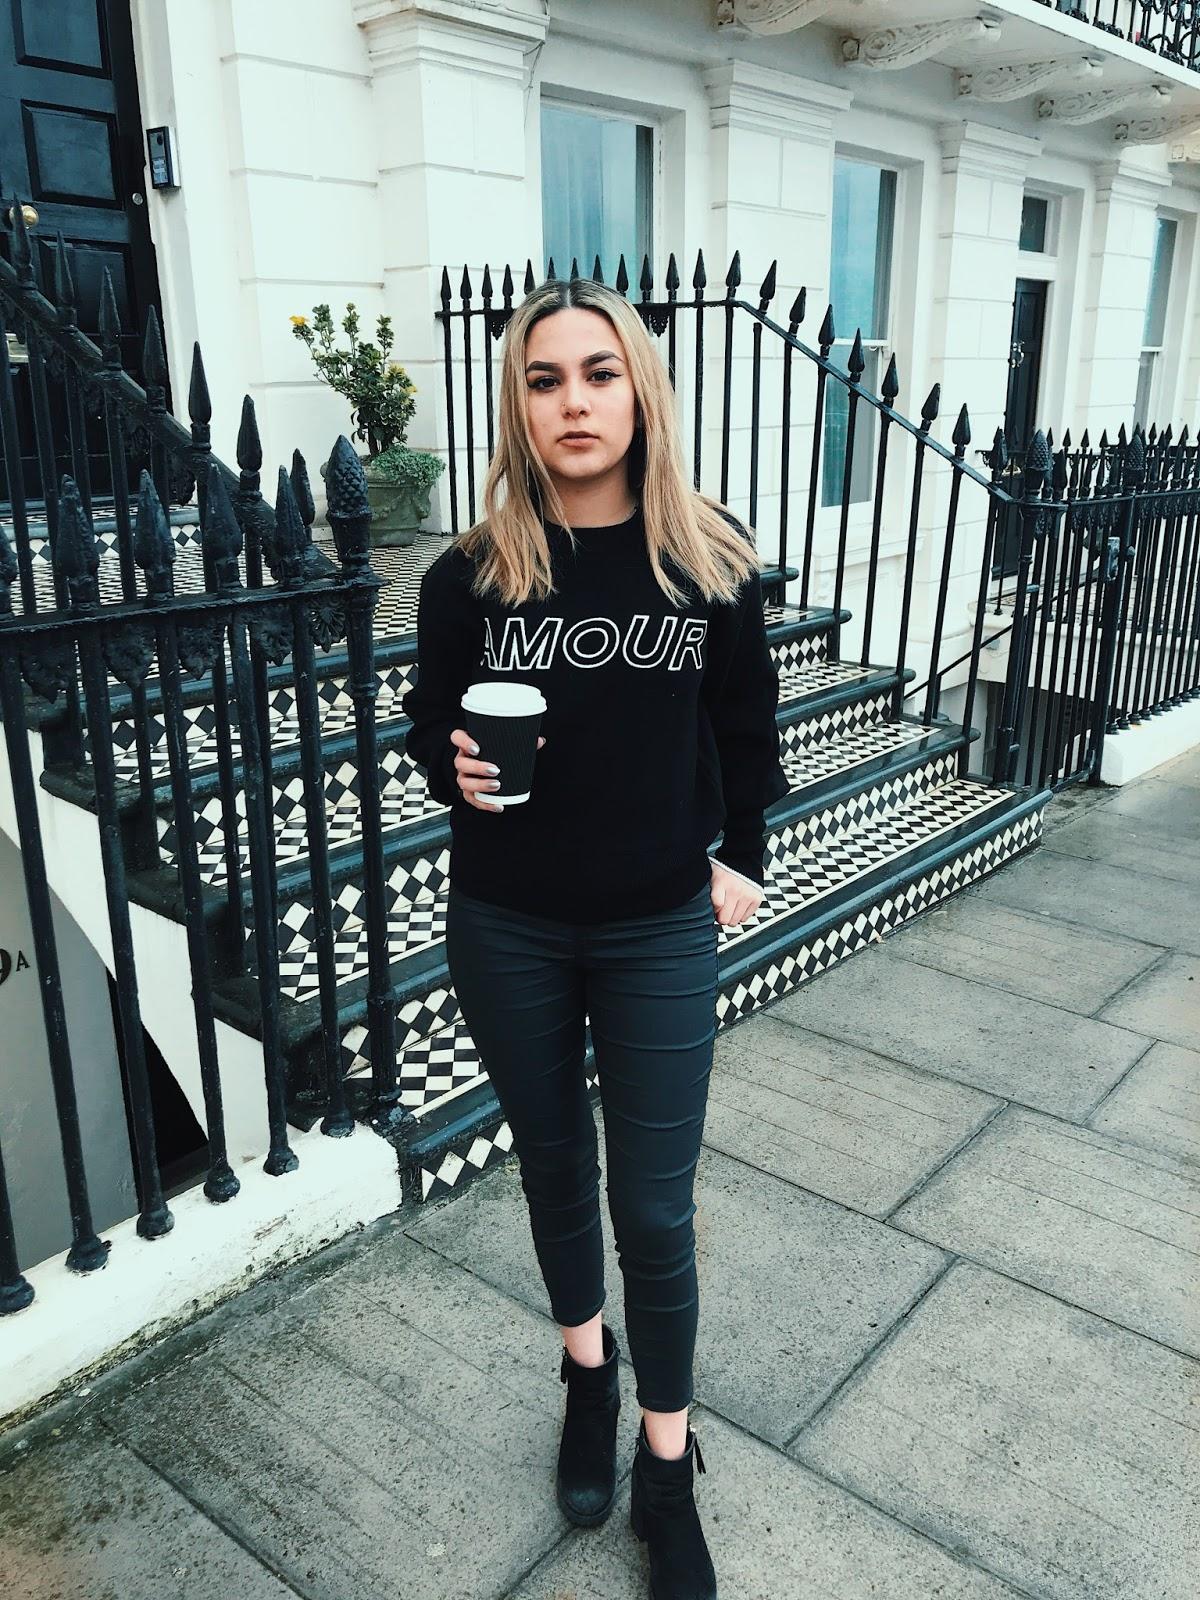 yasminstefanie street style topshop amour slogan jumper coated jeans